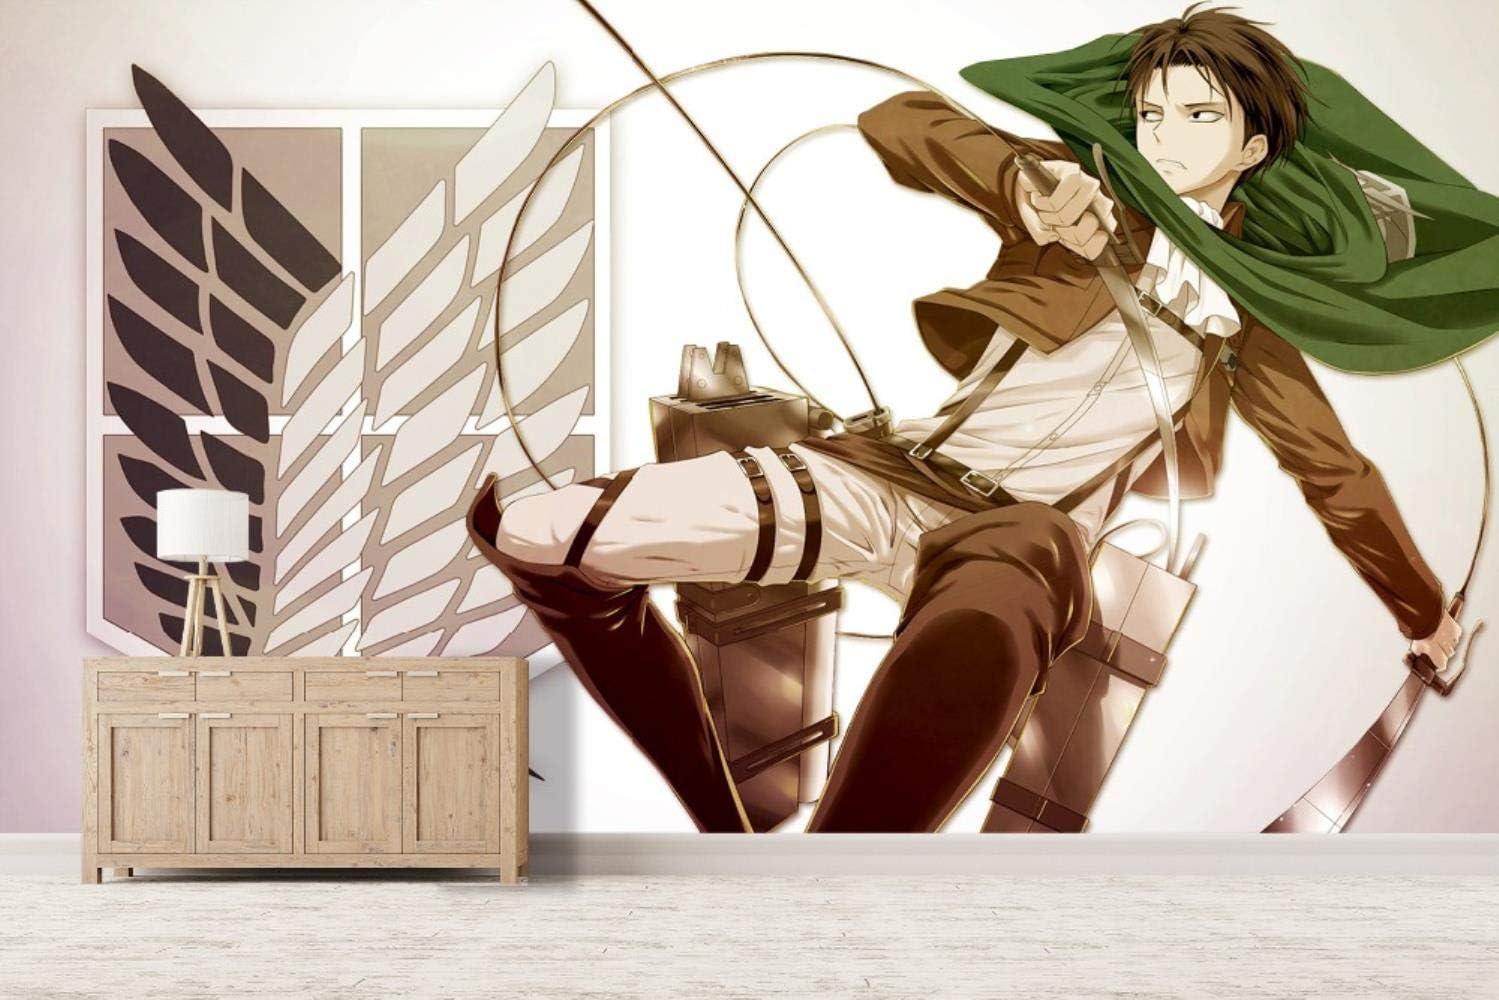 Attack On Titan Anime Wallpaper Wall Mural Children Kids Room 150x105cm 59x41 3 Inch Wxh Amazon Co Uk Diy Tools